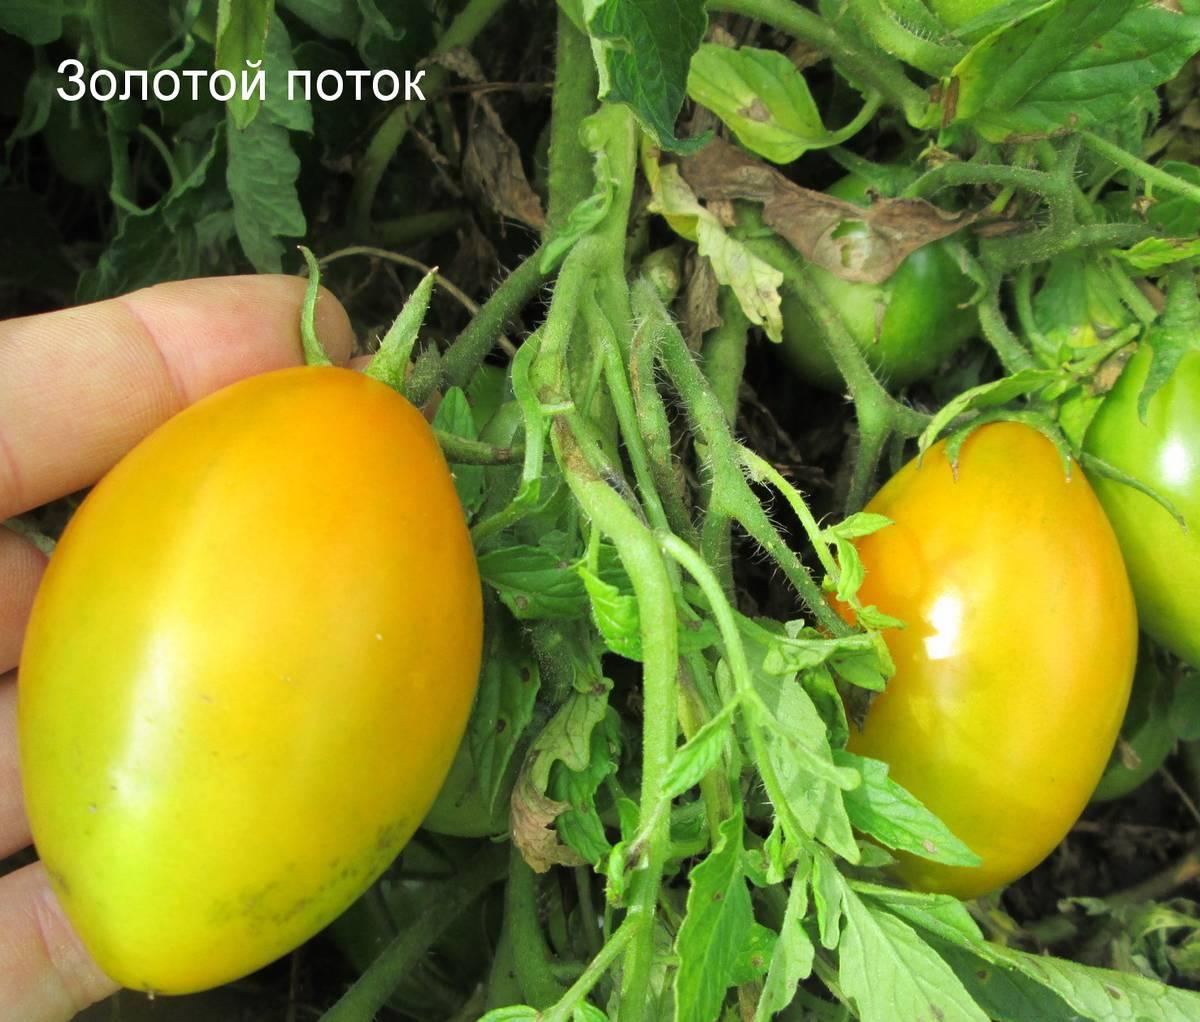 Сорт томата Золотой поток